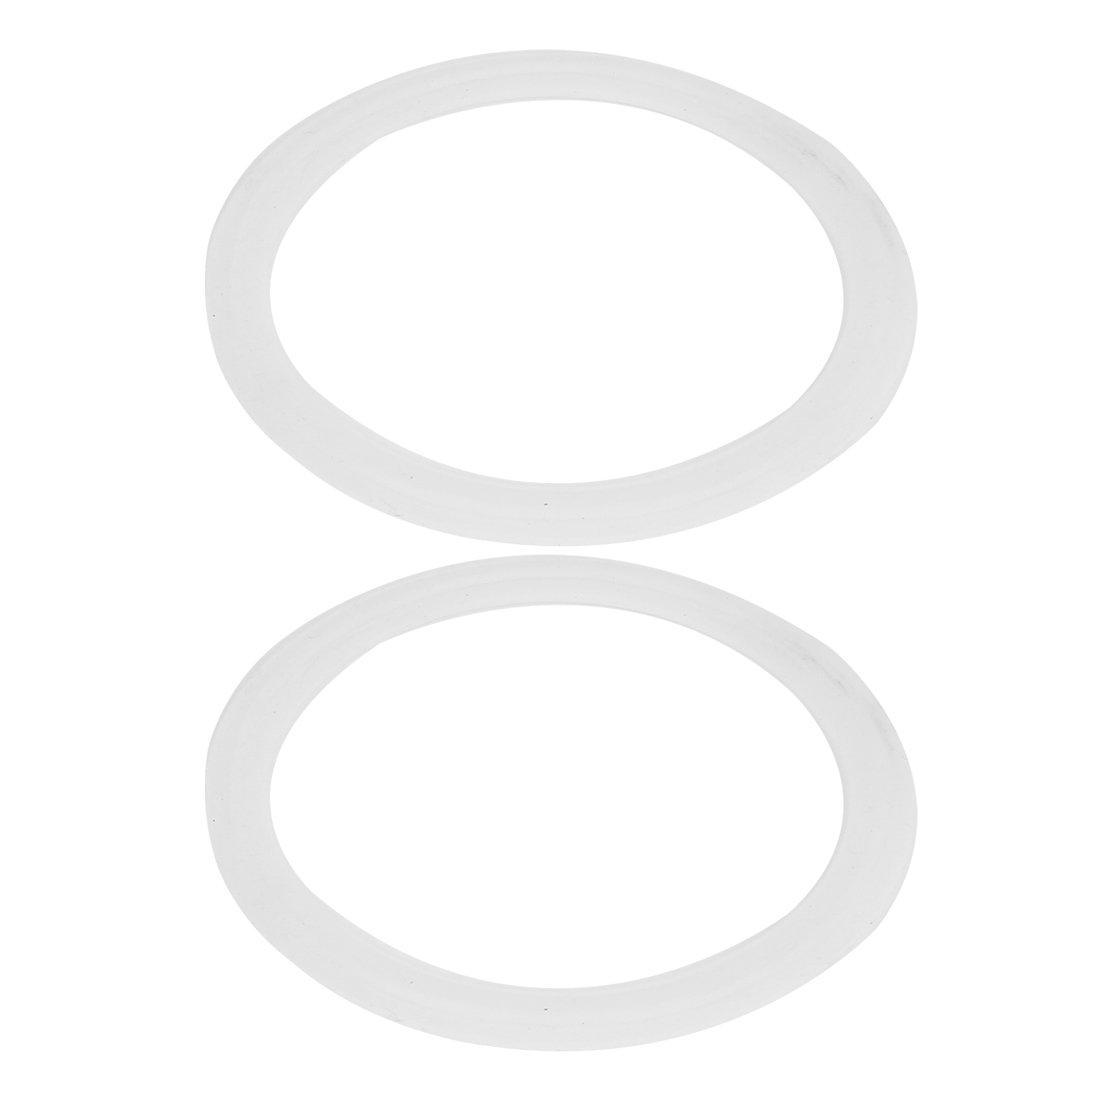 sourcingmap/® 2Stk 67mm Silikon Dichtung 2.5 Tri Klemme Sanit/äre Rohr Formst/ück Beschl/äge de